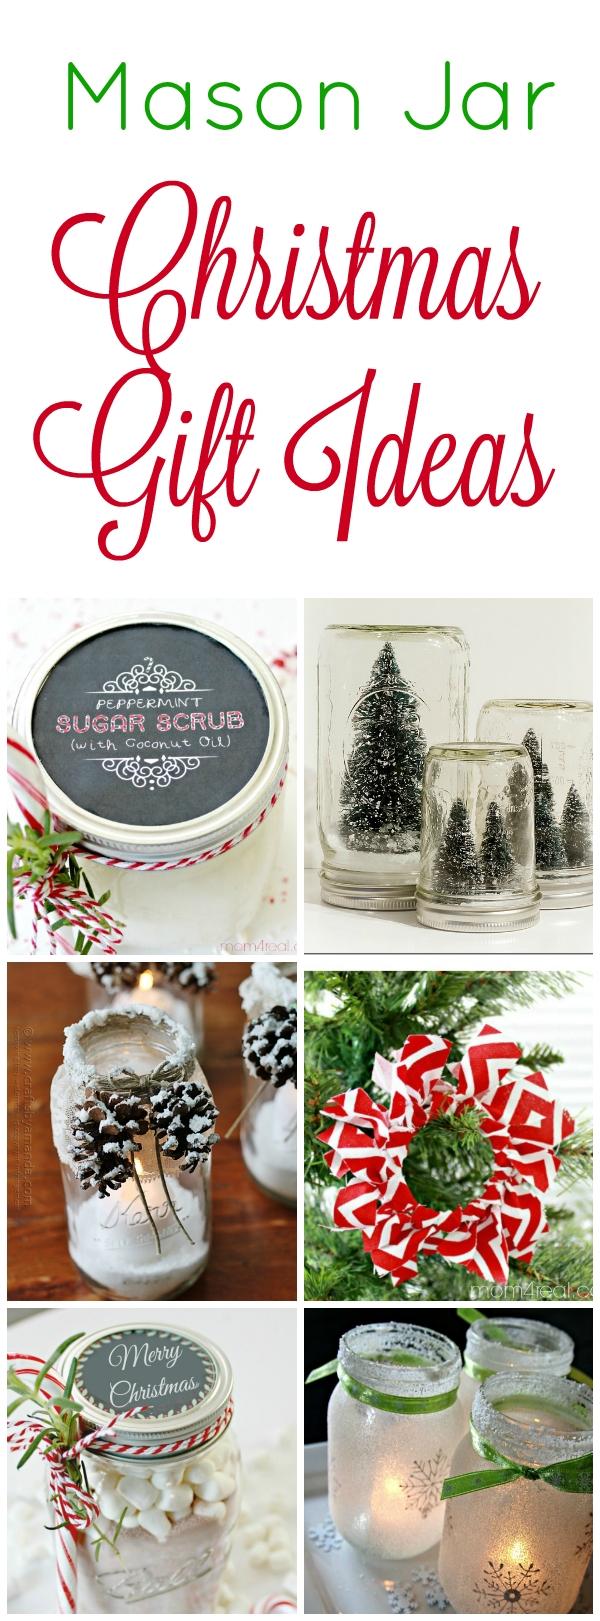 10 Stylish Christmas Gift Idea For Mom 14 mason jar christmas gift ideas mom 4 real 4 2020